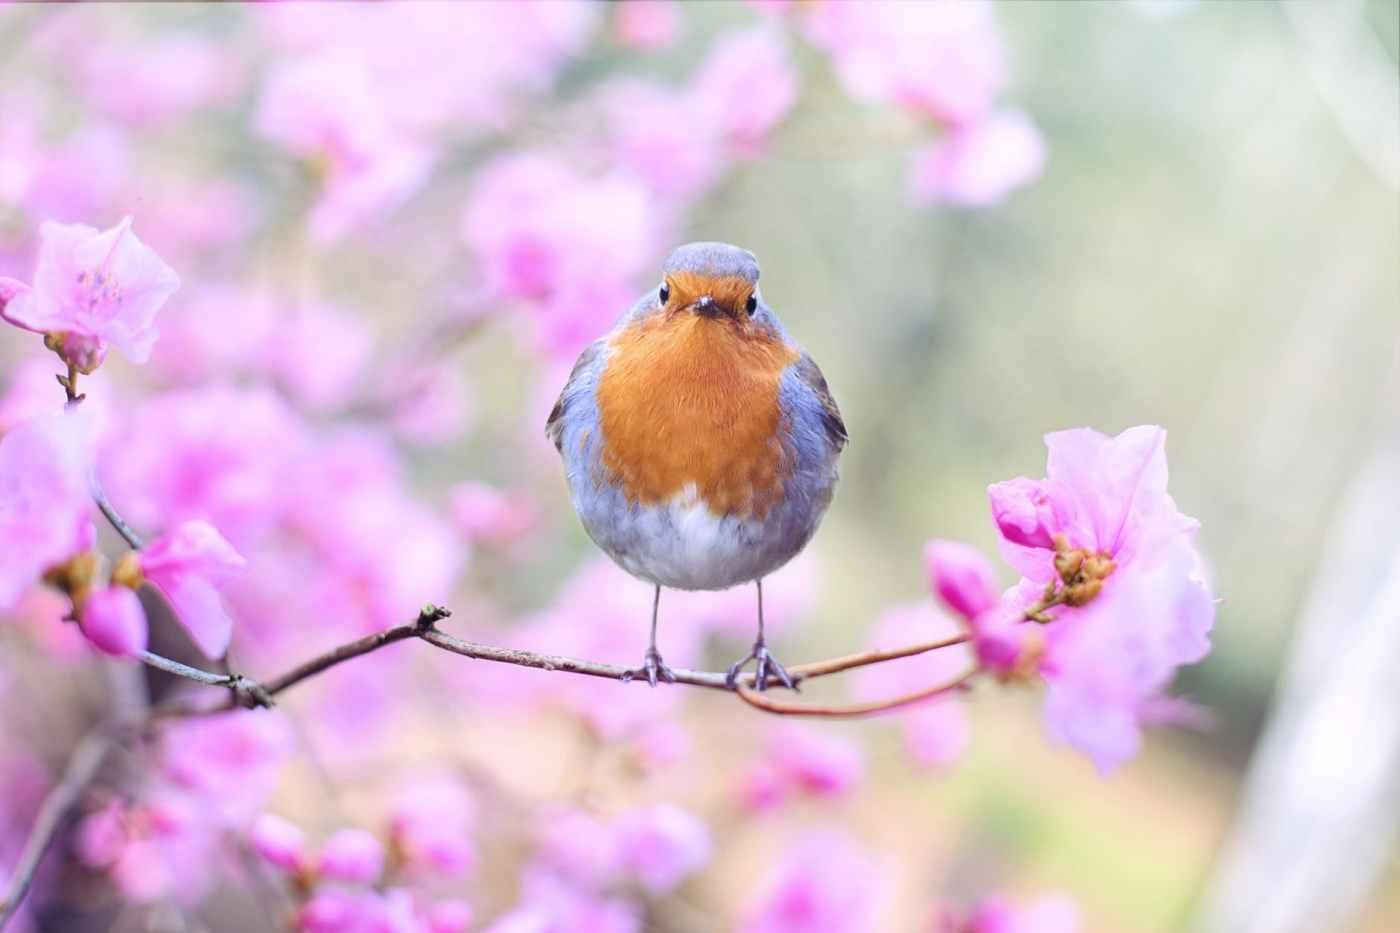 Lily the bird